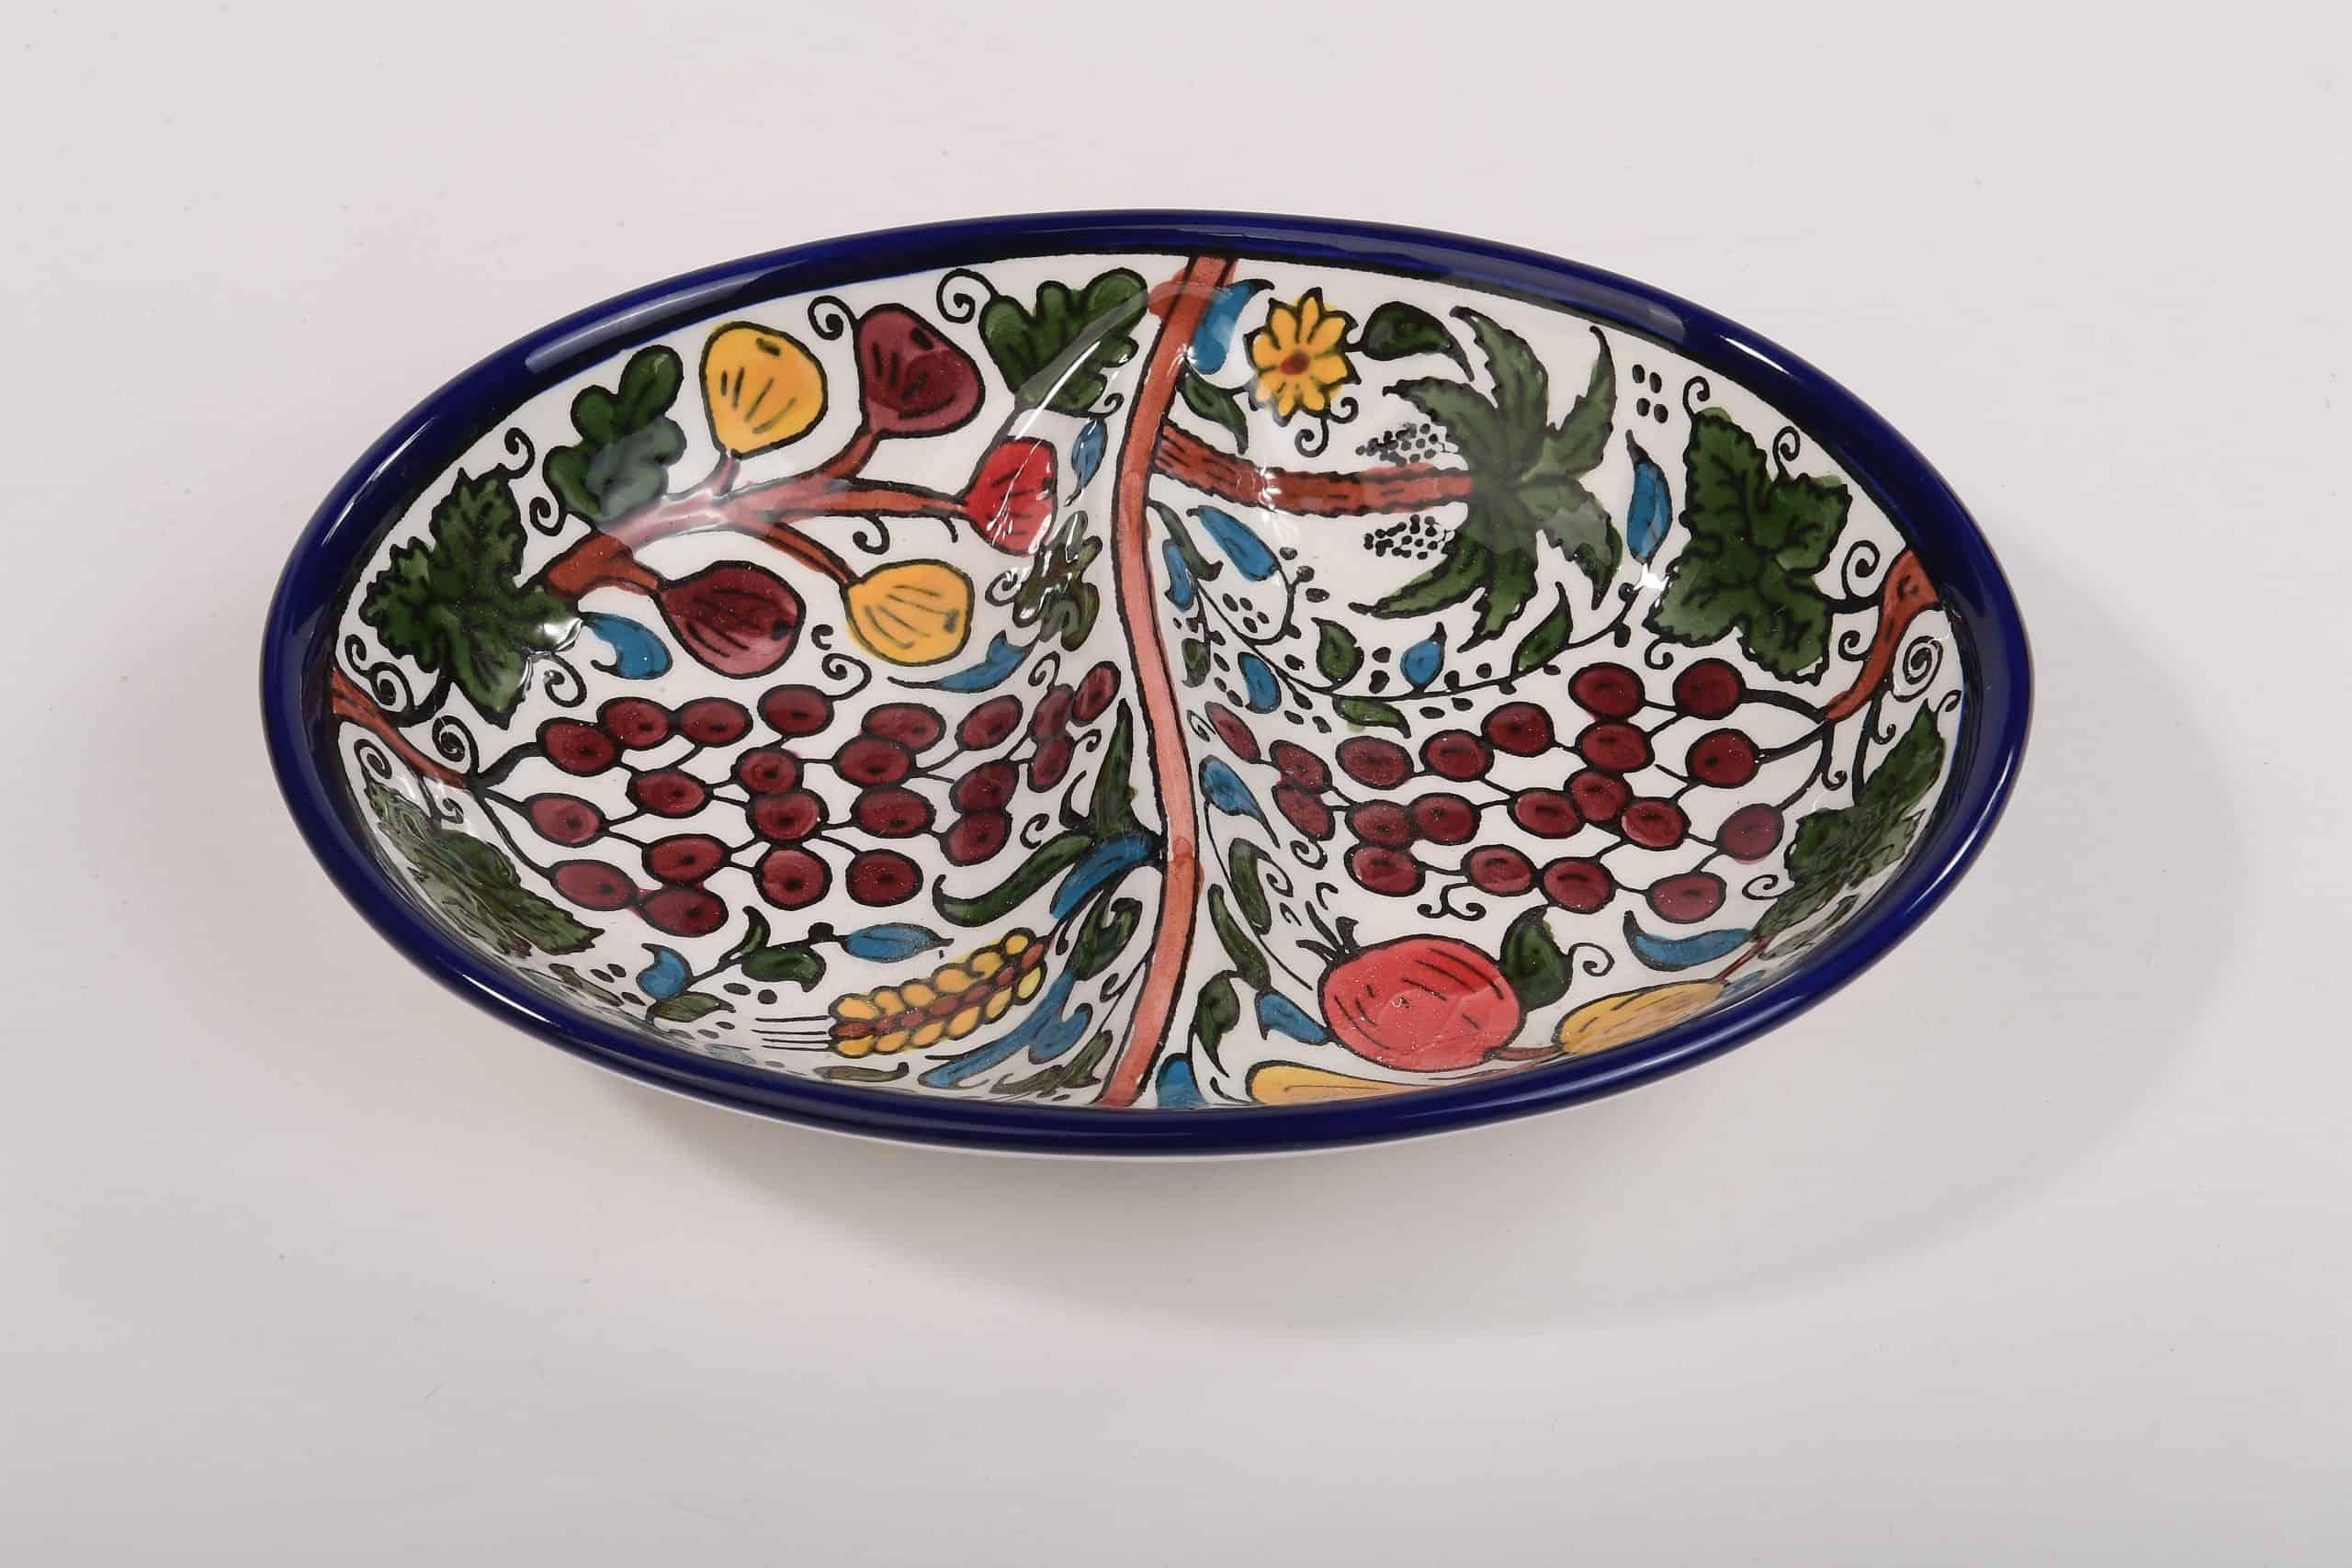 Armenian Pomegranate Ceramic Bowl with Seven Species Design. Armenian Ceramic Hand painted